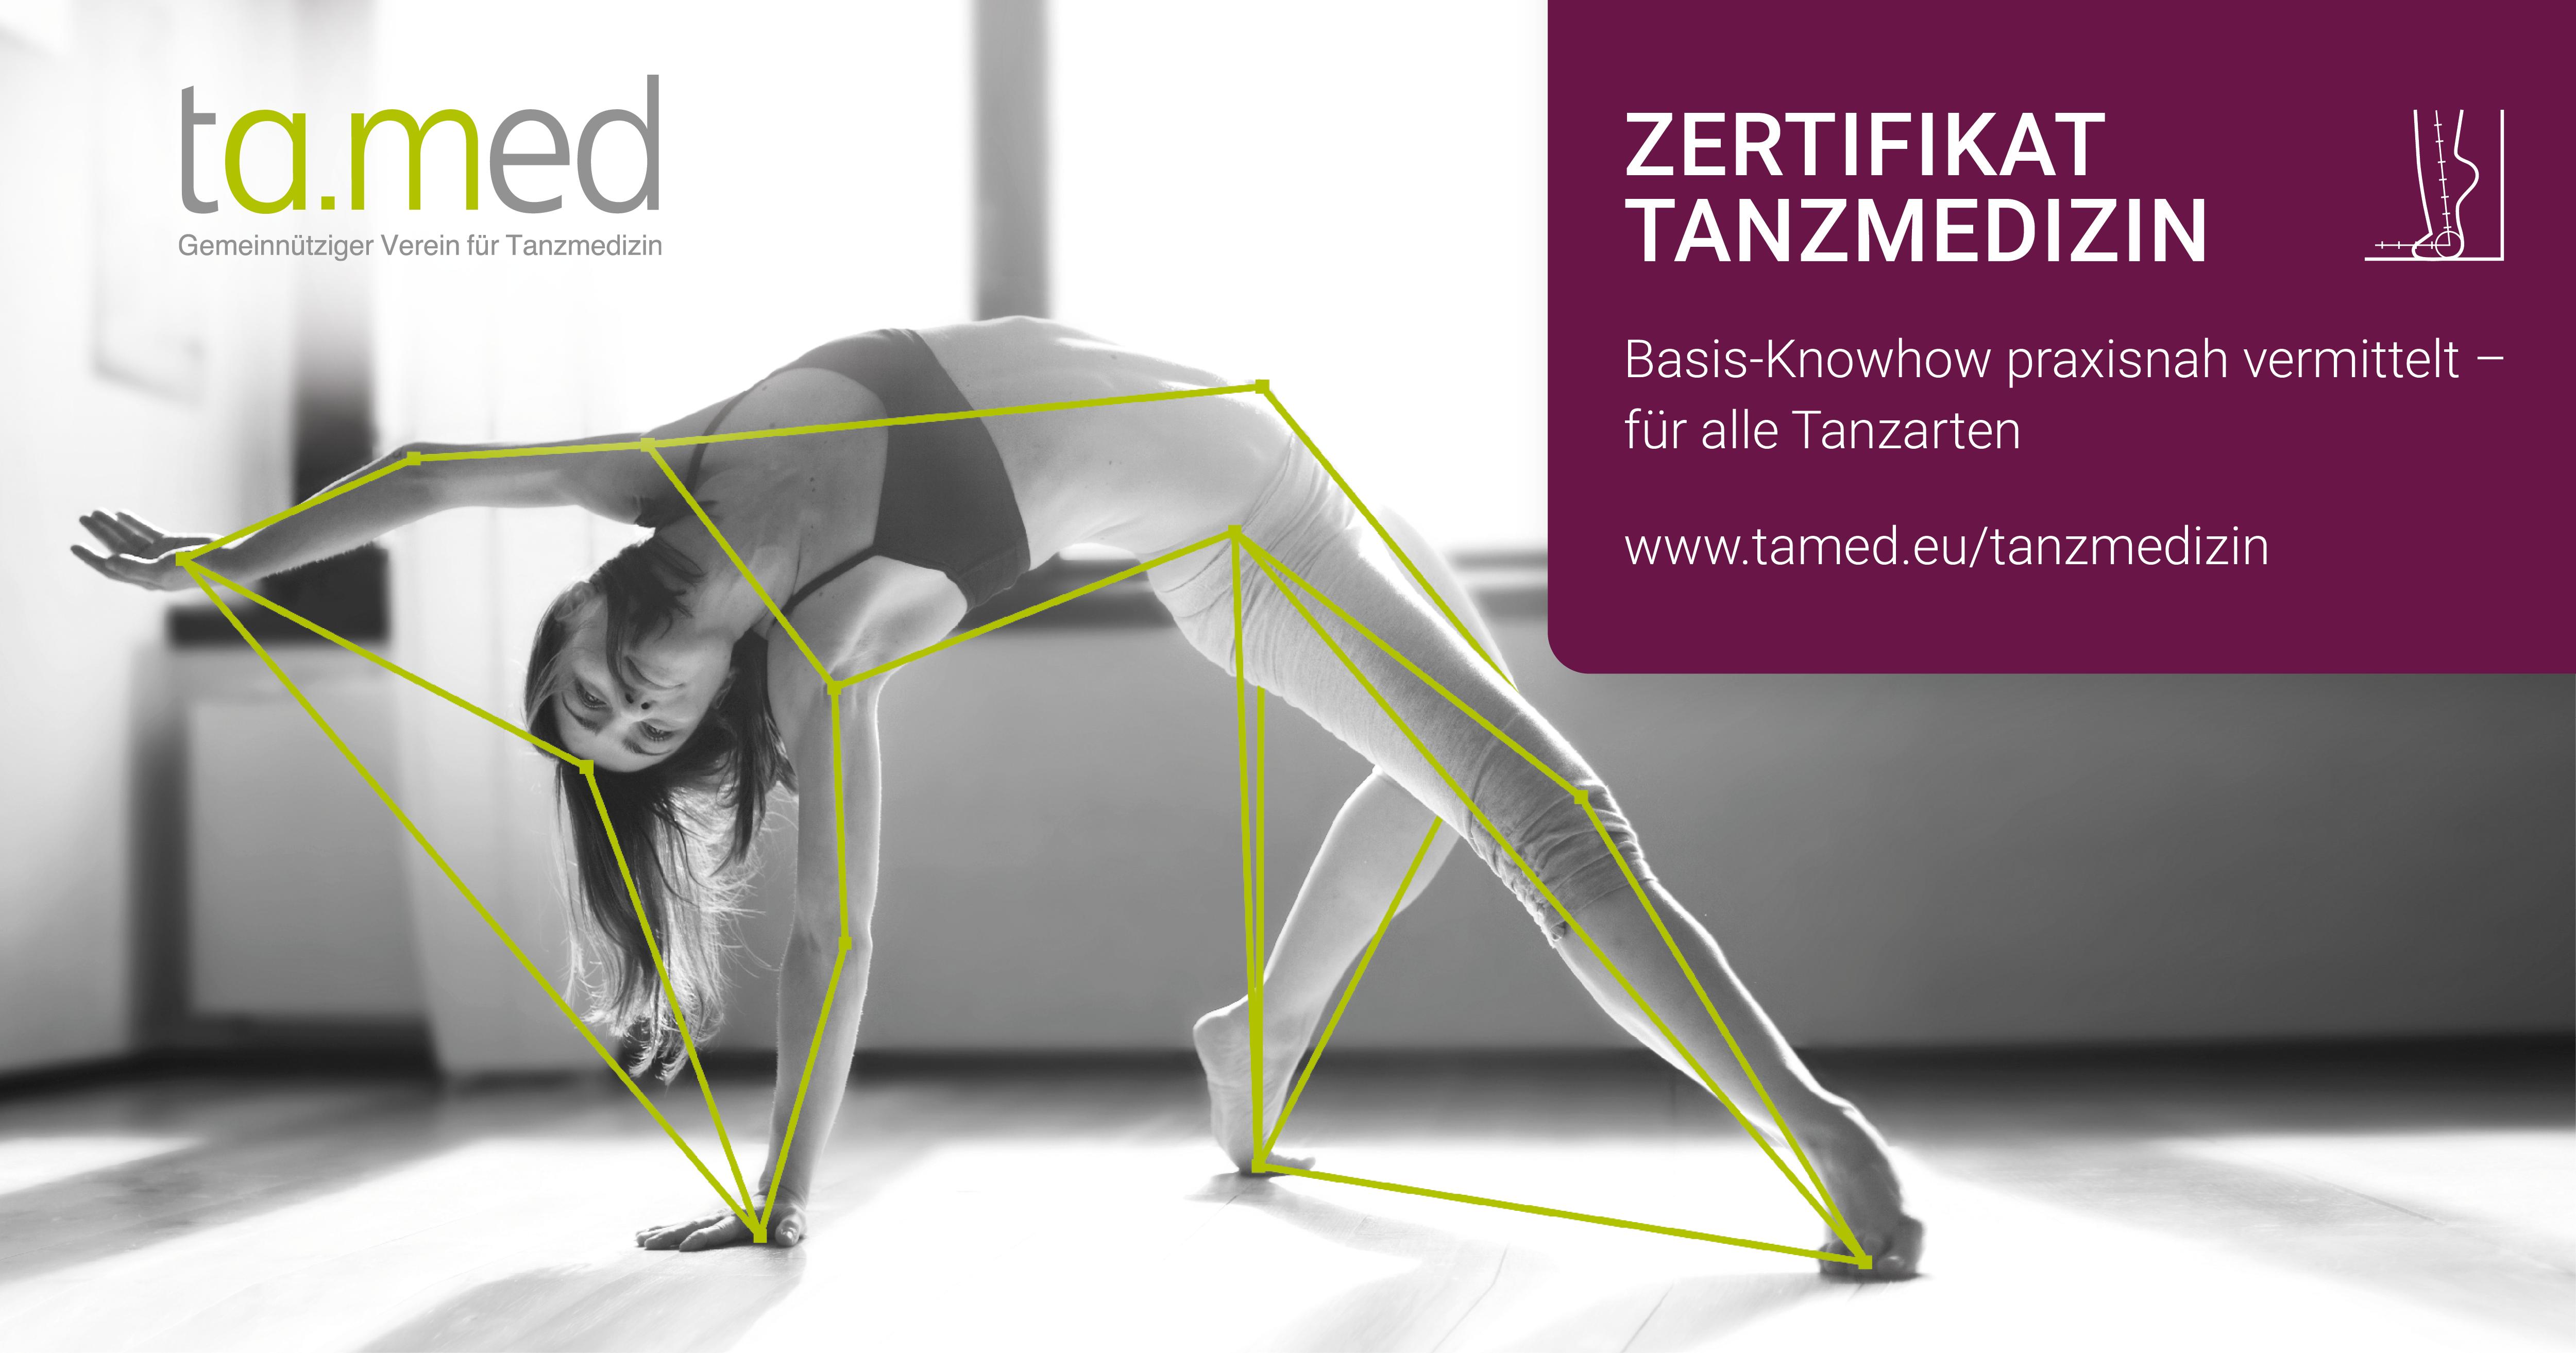 Zertifikat Tanzmedizin